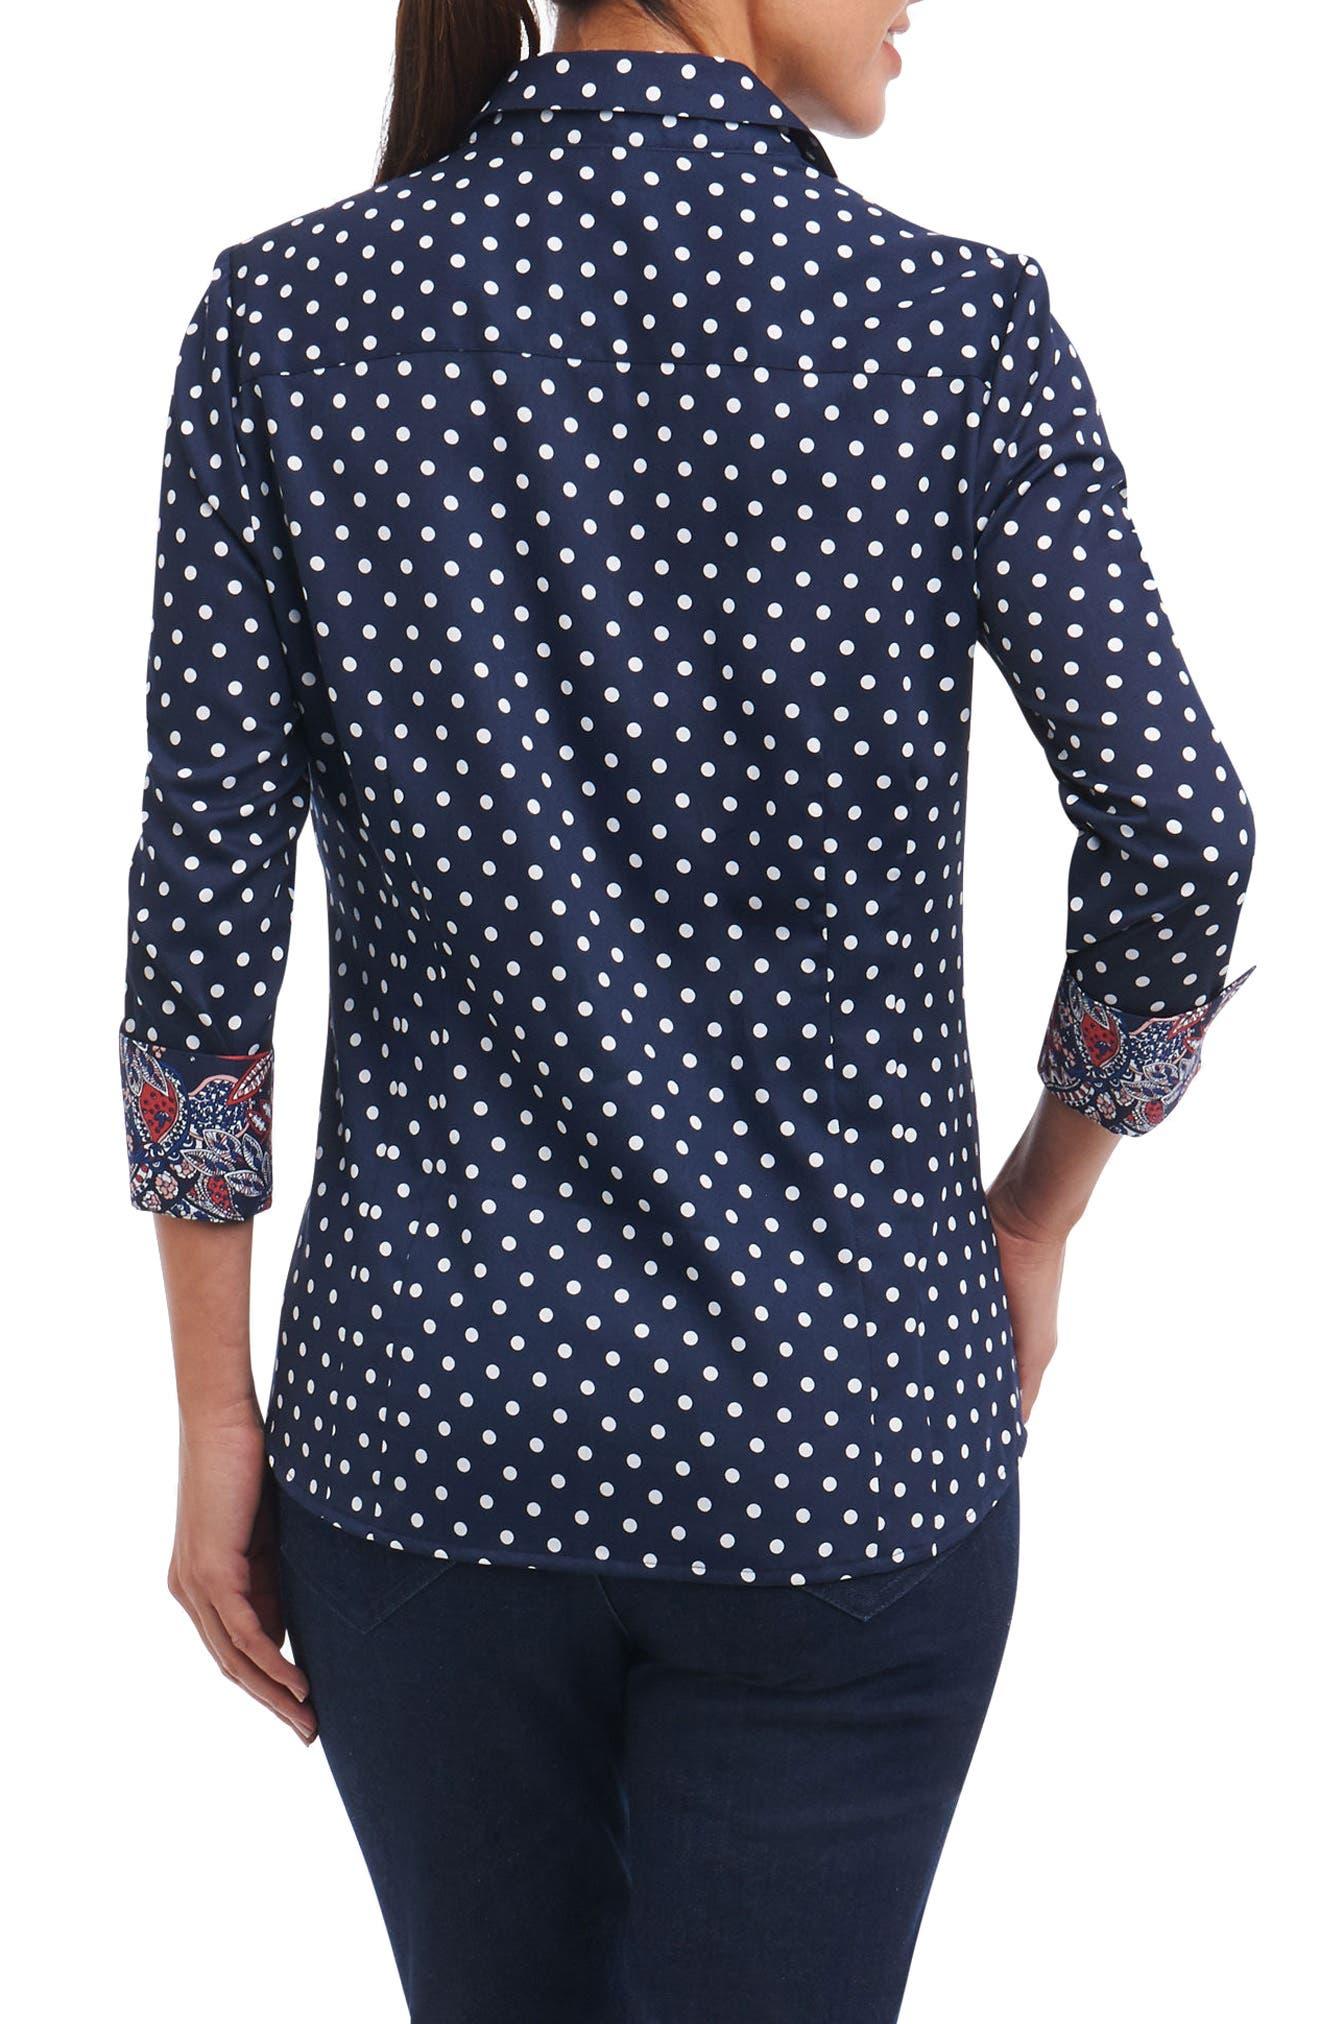 Taylor Classic Dot Non-Iron Cotton Shirt,                             Alternate thumbnail 2, color,